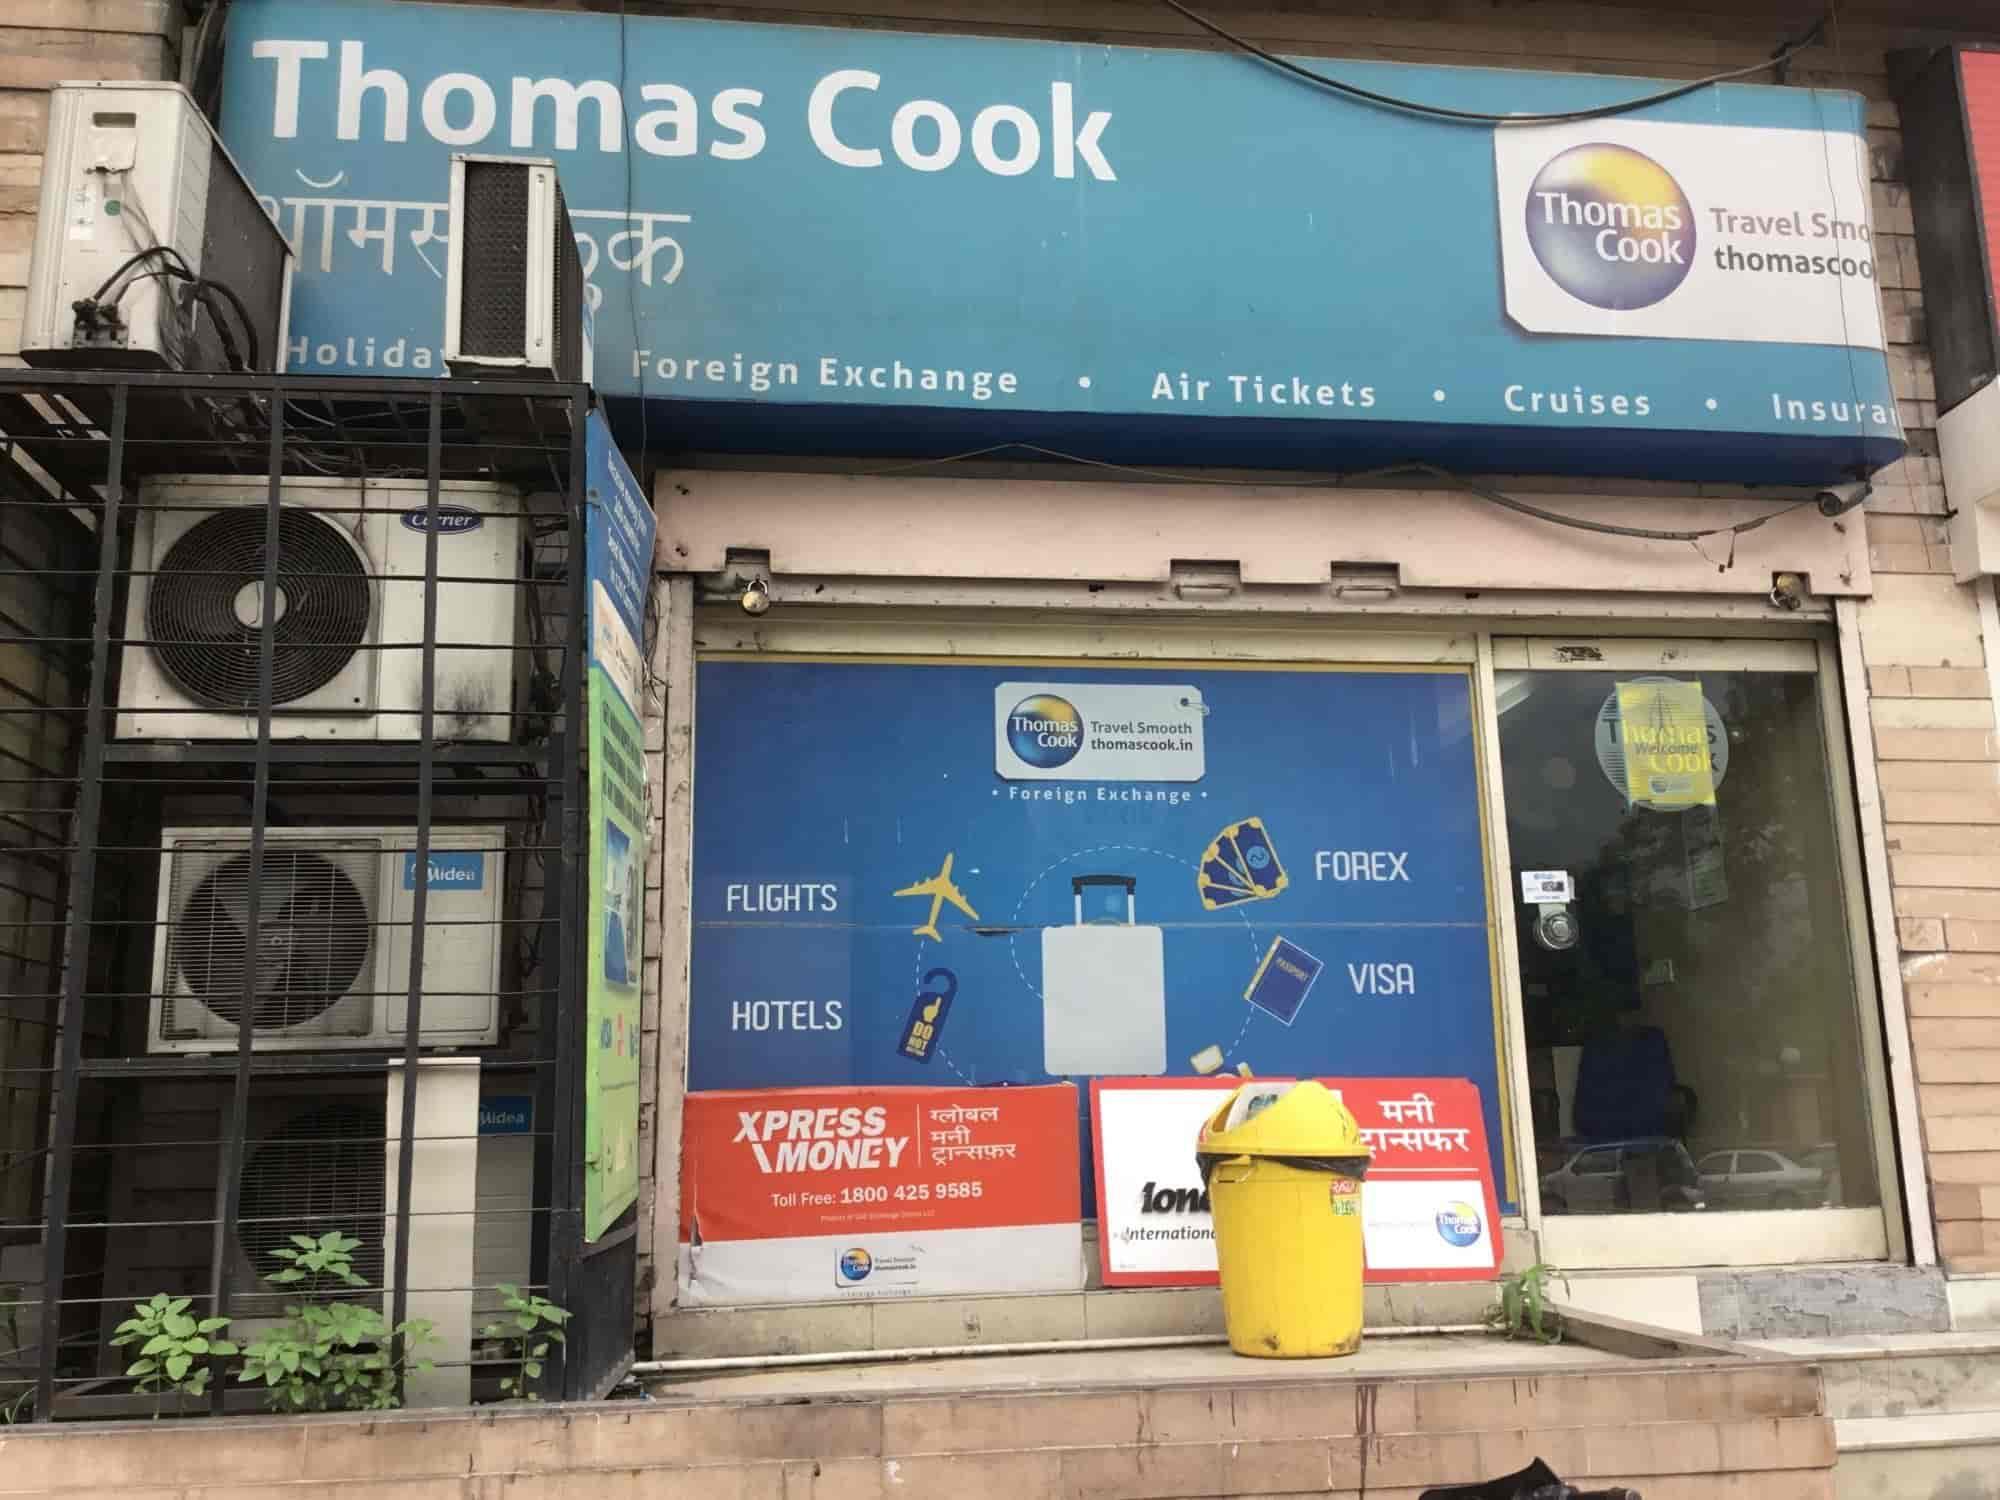 Thomas cook forex jaipur мастерфорекс-v кто он